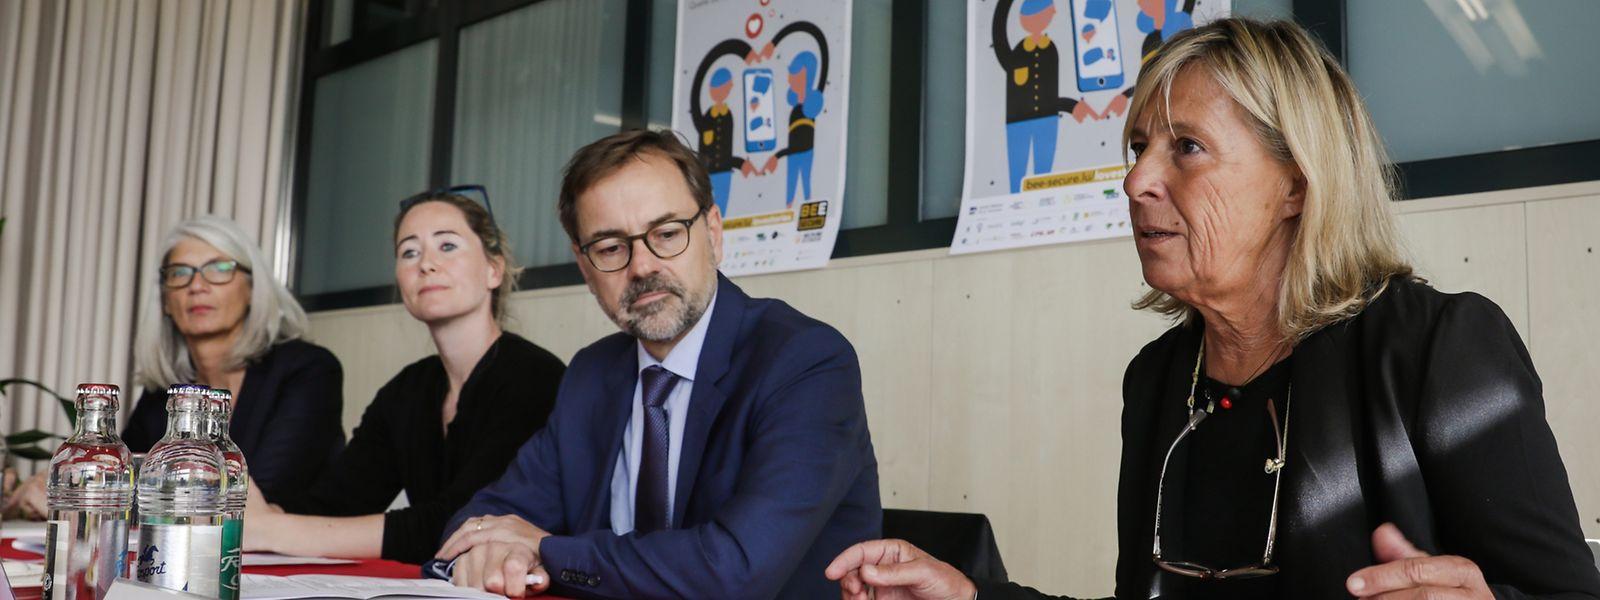 "Präsentierten die ""Love Stories 4.0""-Kampagne: Jutta Gansemer (AFP-Solidarité Famille), Debora Plein (Bee Secure), Georges Metz (Service National de la Jeunesse) und Barbara Gorges-Wagner (Kanner-Jugendtelefon) (v.l.n.r.)."